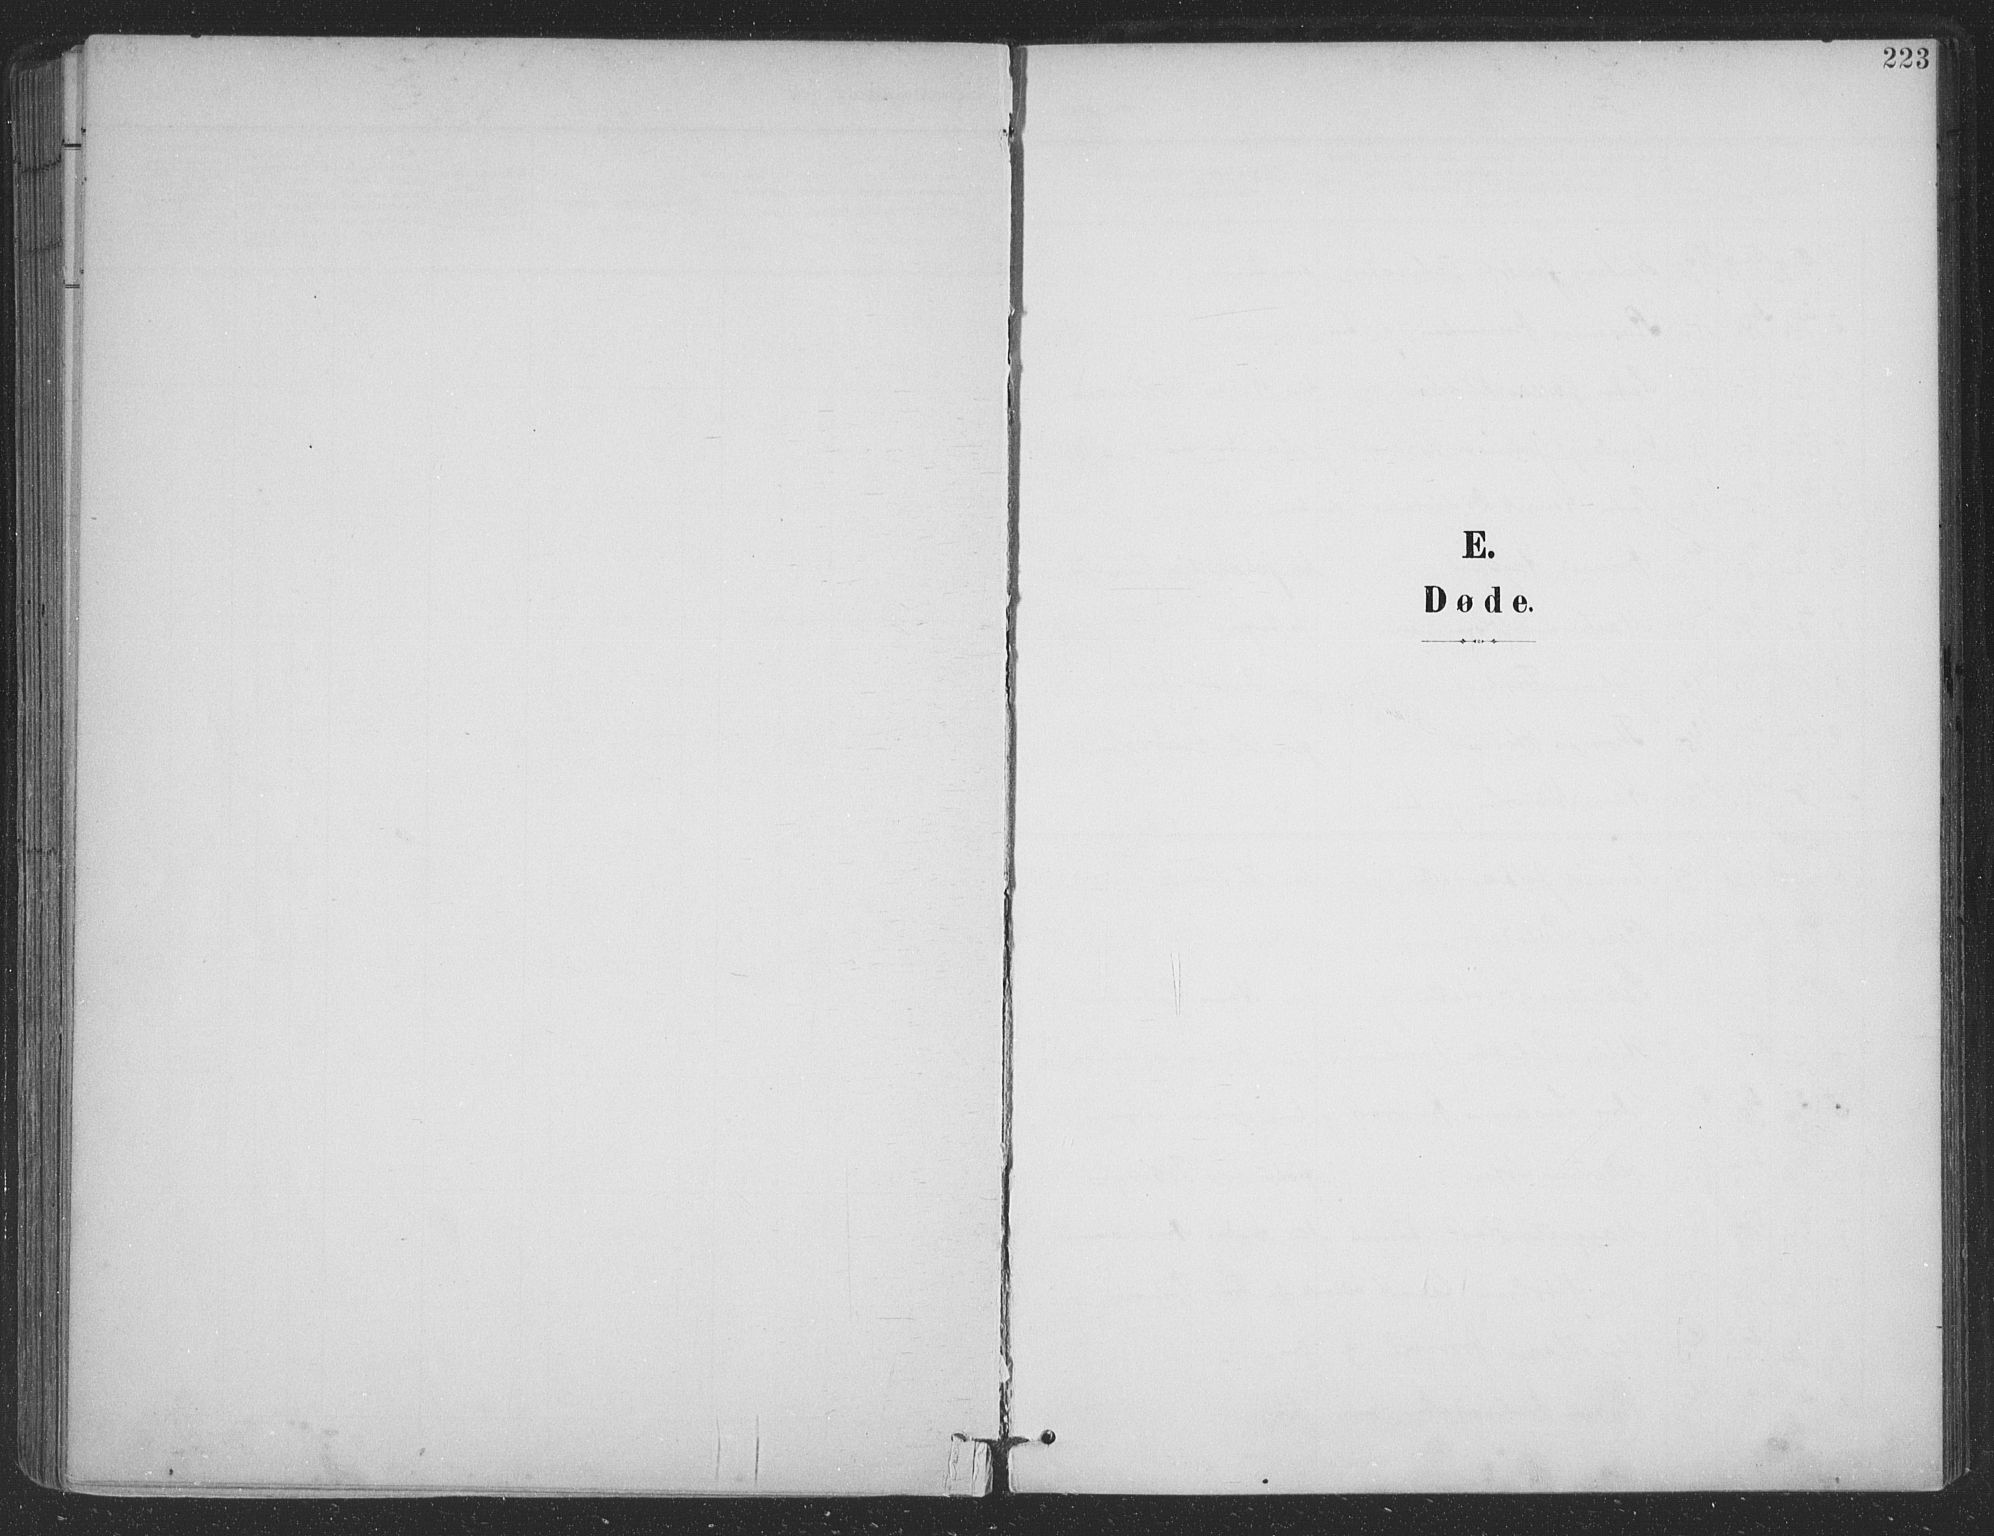 SAT, Ministerialprotokoller, klokkerbøker og fødselsregistre - Nordland, 863/L0899: Ministerialbok nr. 863A11, 1897-1906, s. 223